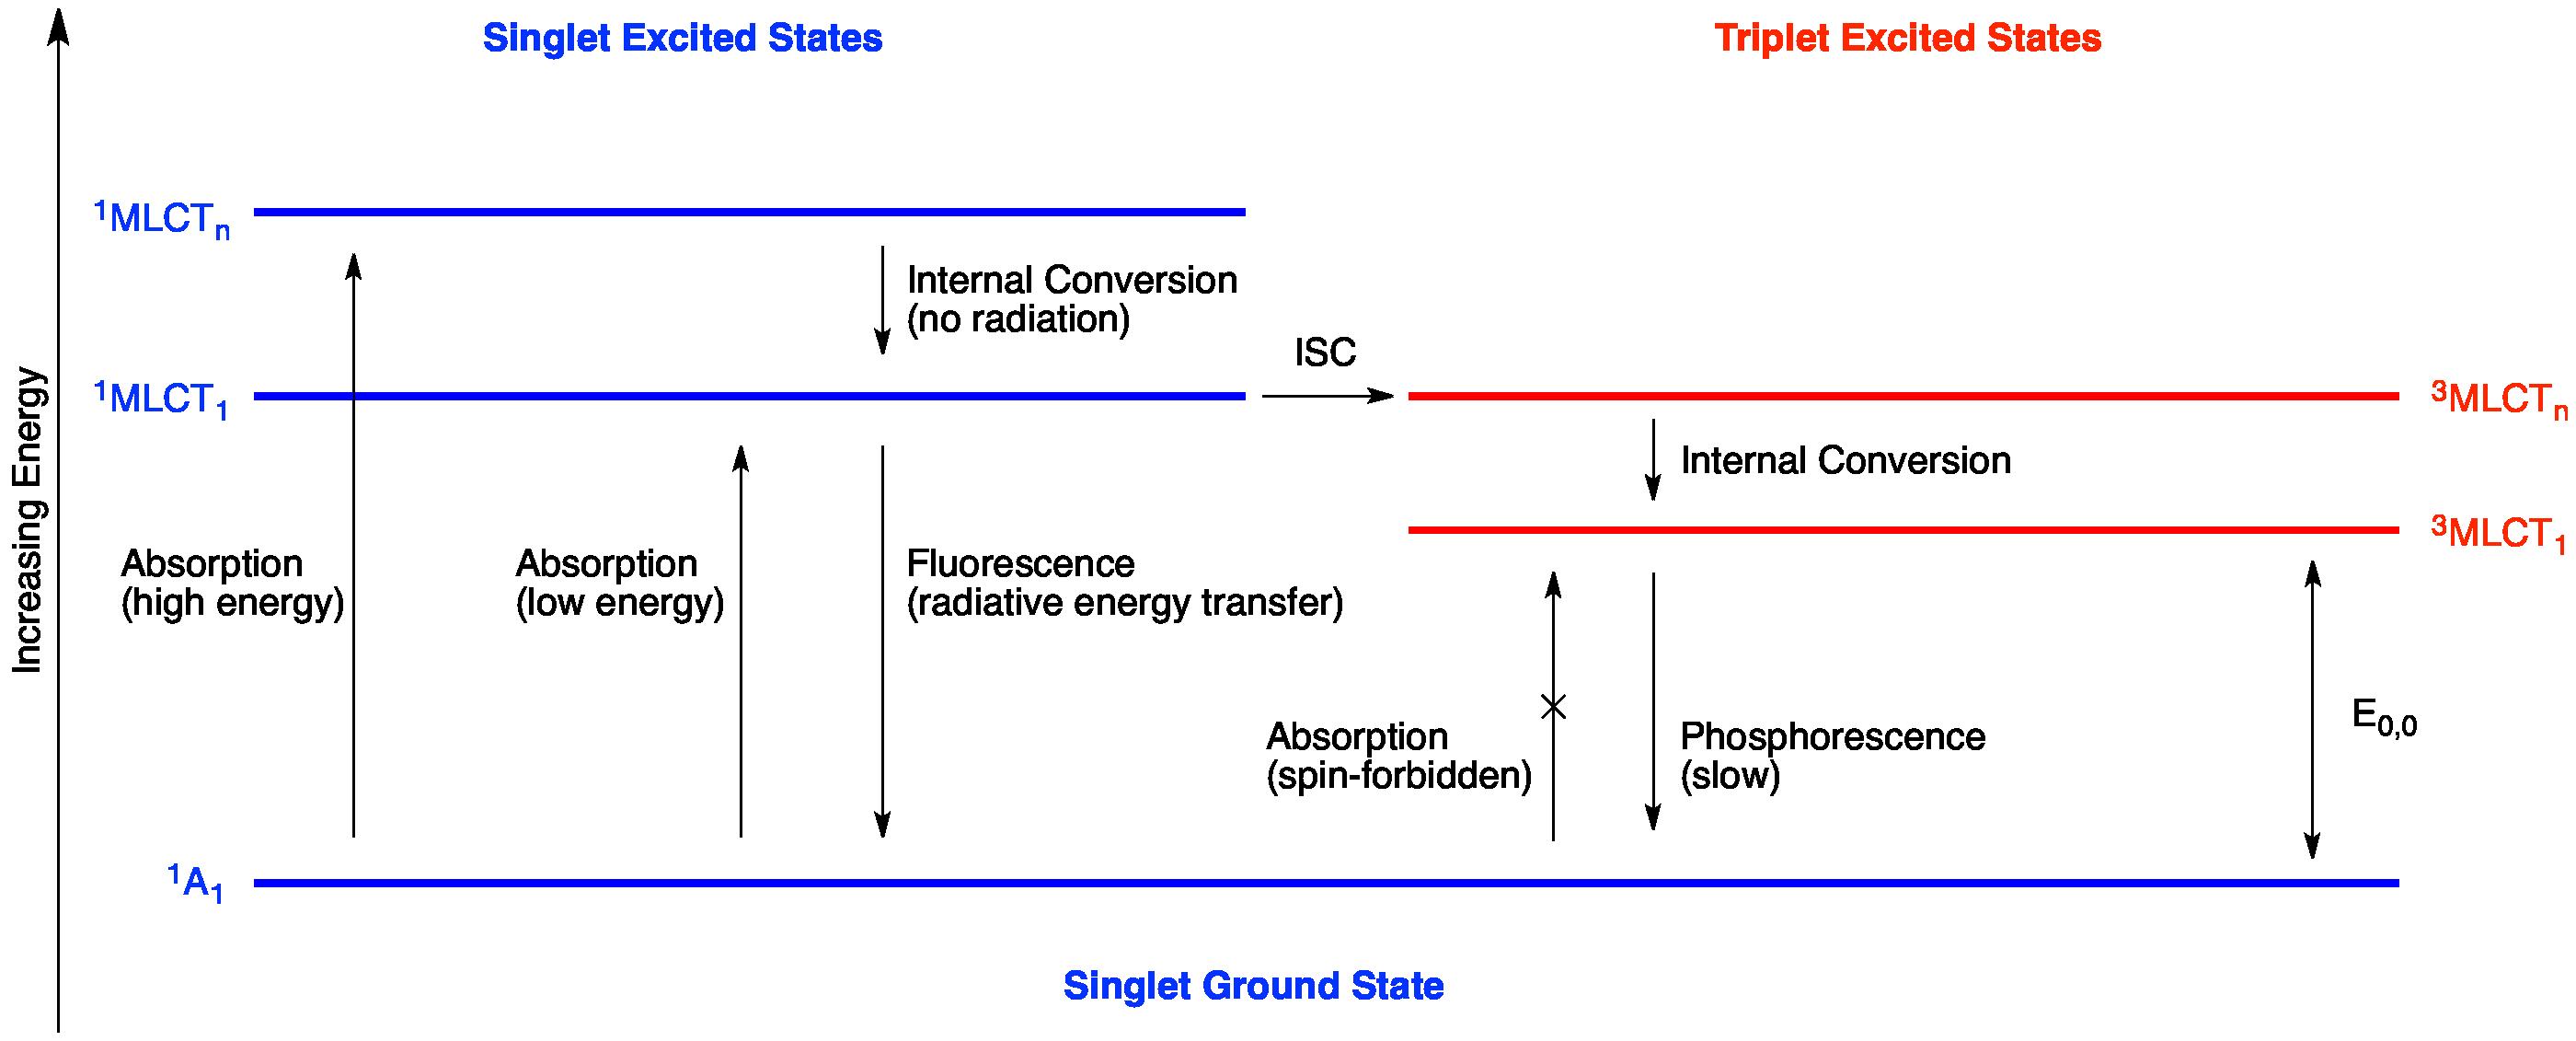 Filejablonski diagramg wikimedia commons filejablonski diagramg ccuart Choice Image